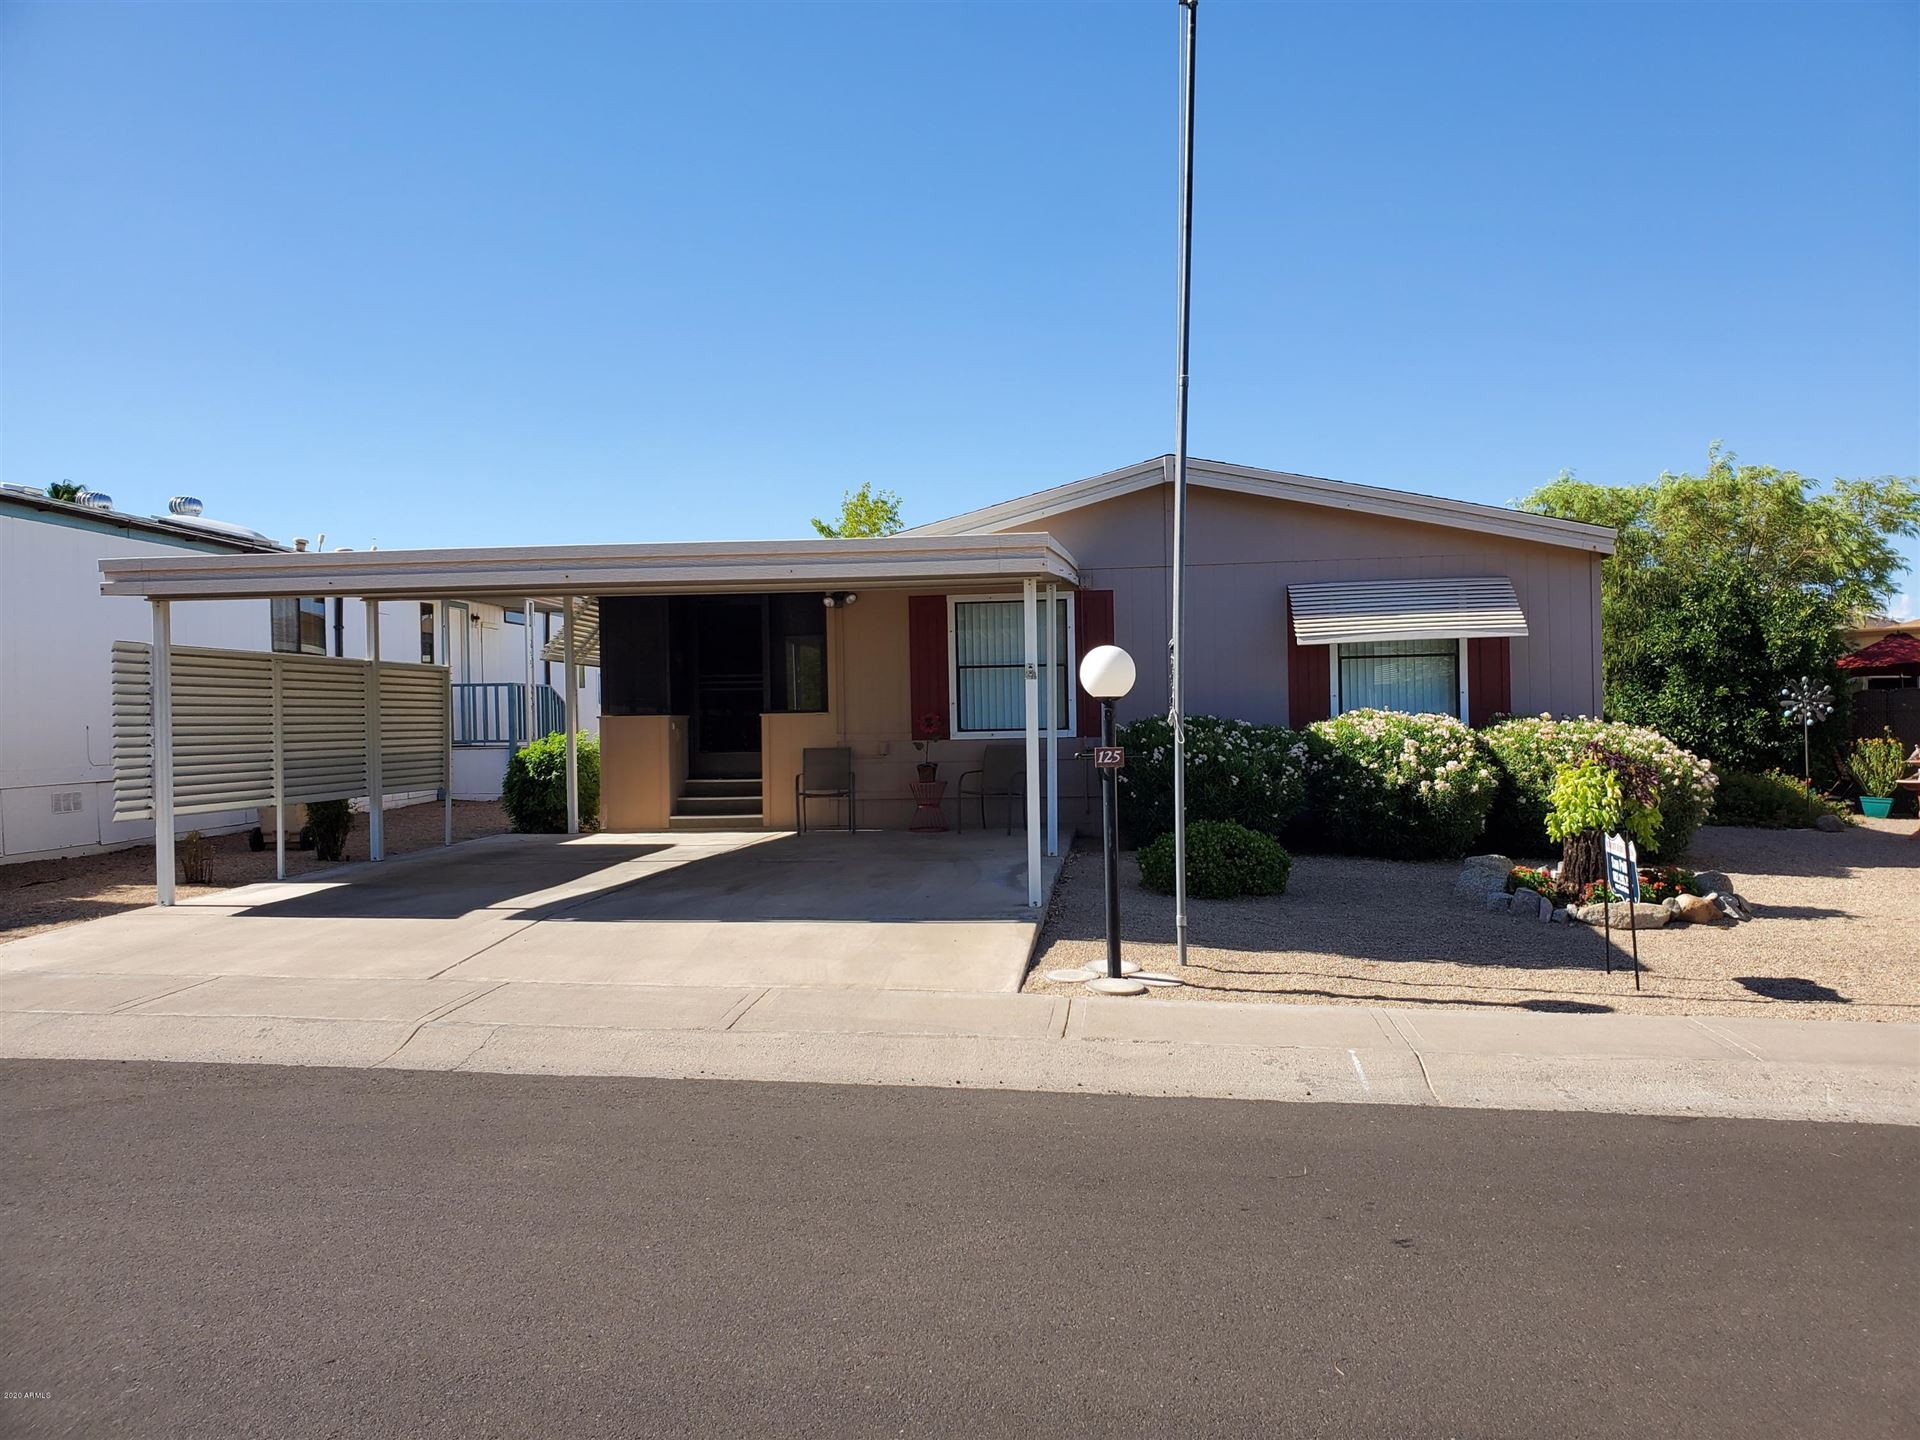 2233 E BEHREND Drive #Lot 125, Phoenix, AZ 85024 - MLS#: 6099431